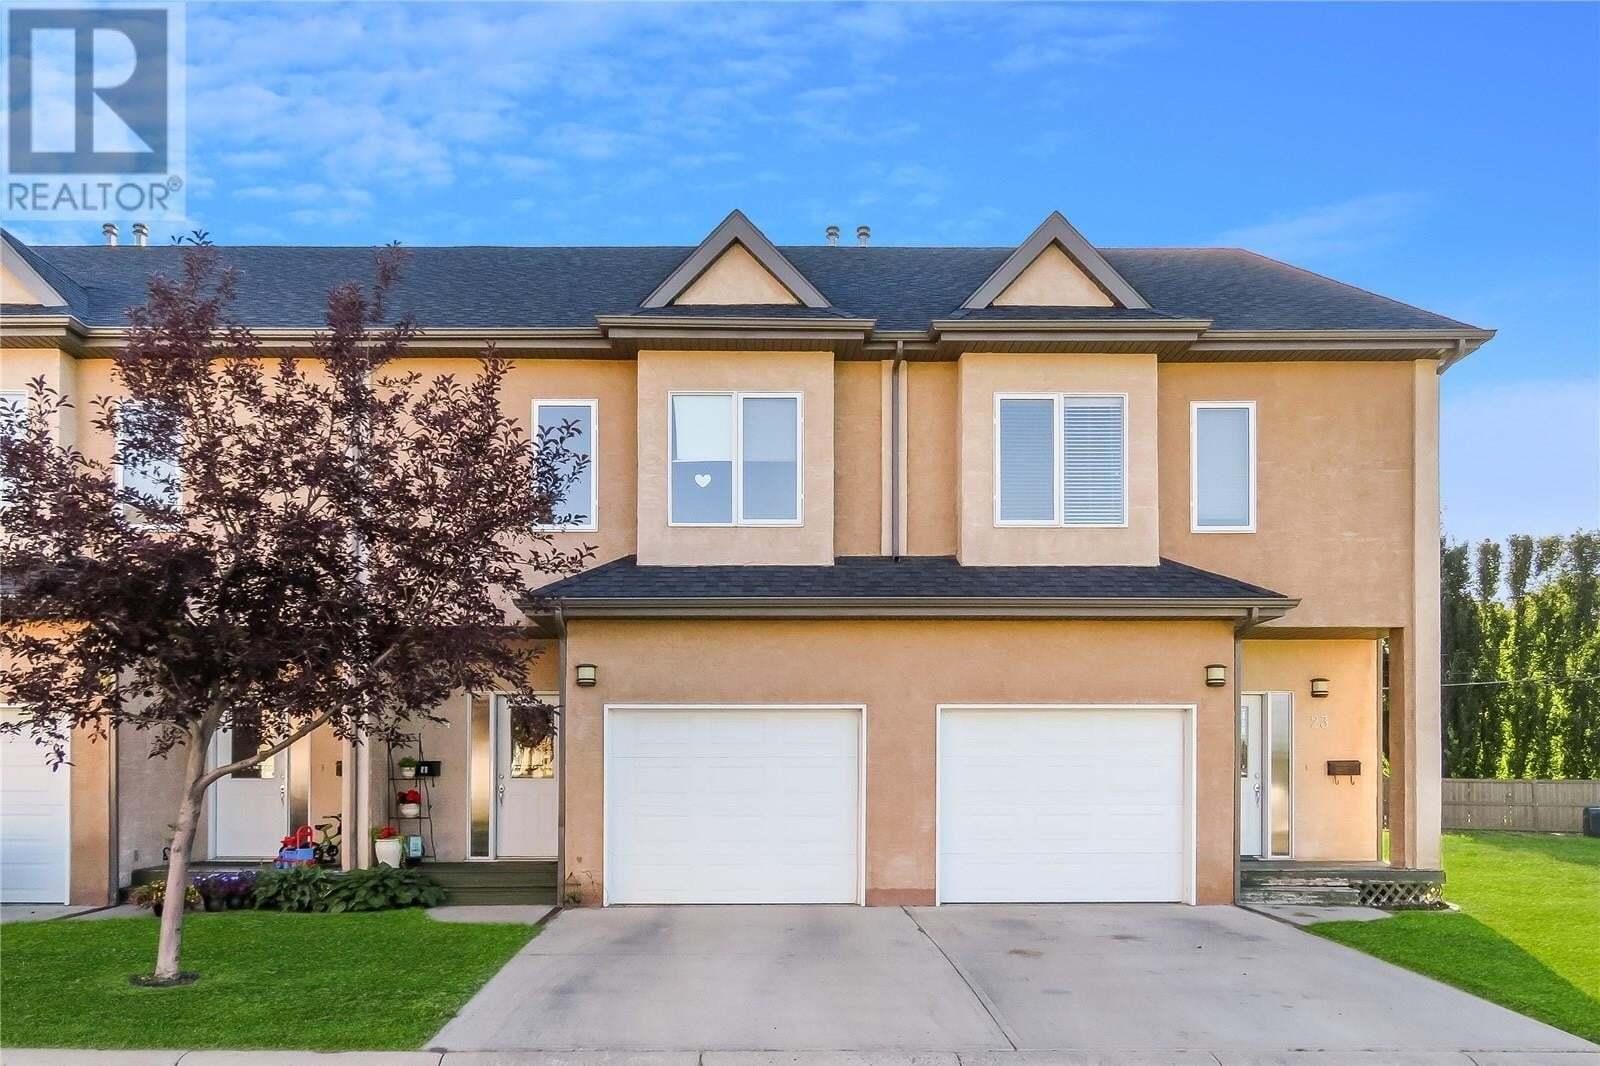 Townhouse for sale at 701 Mcintosh St E Unit 24 Swift Current Saskatchewan - MLS: SK819194